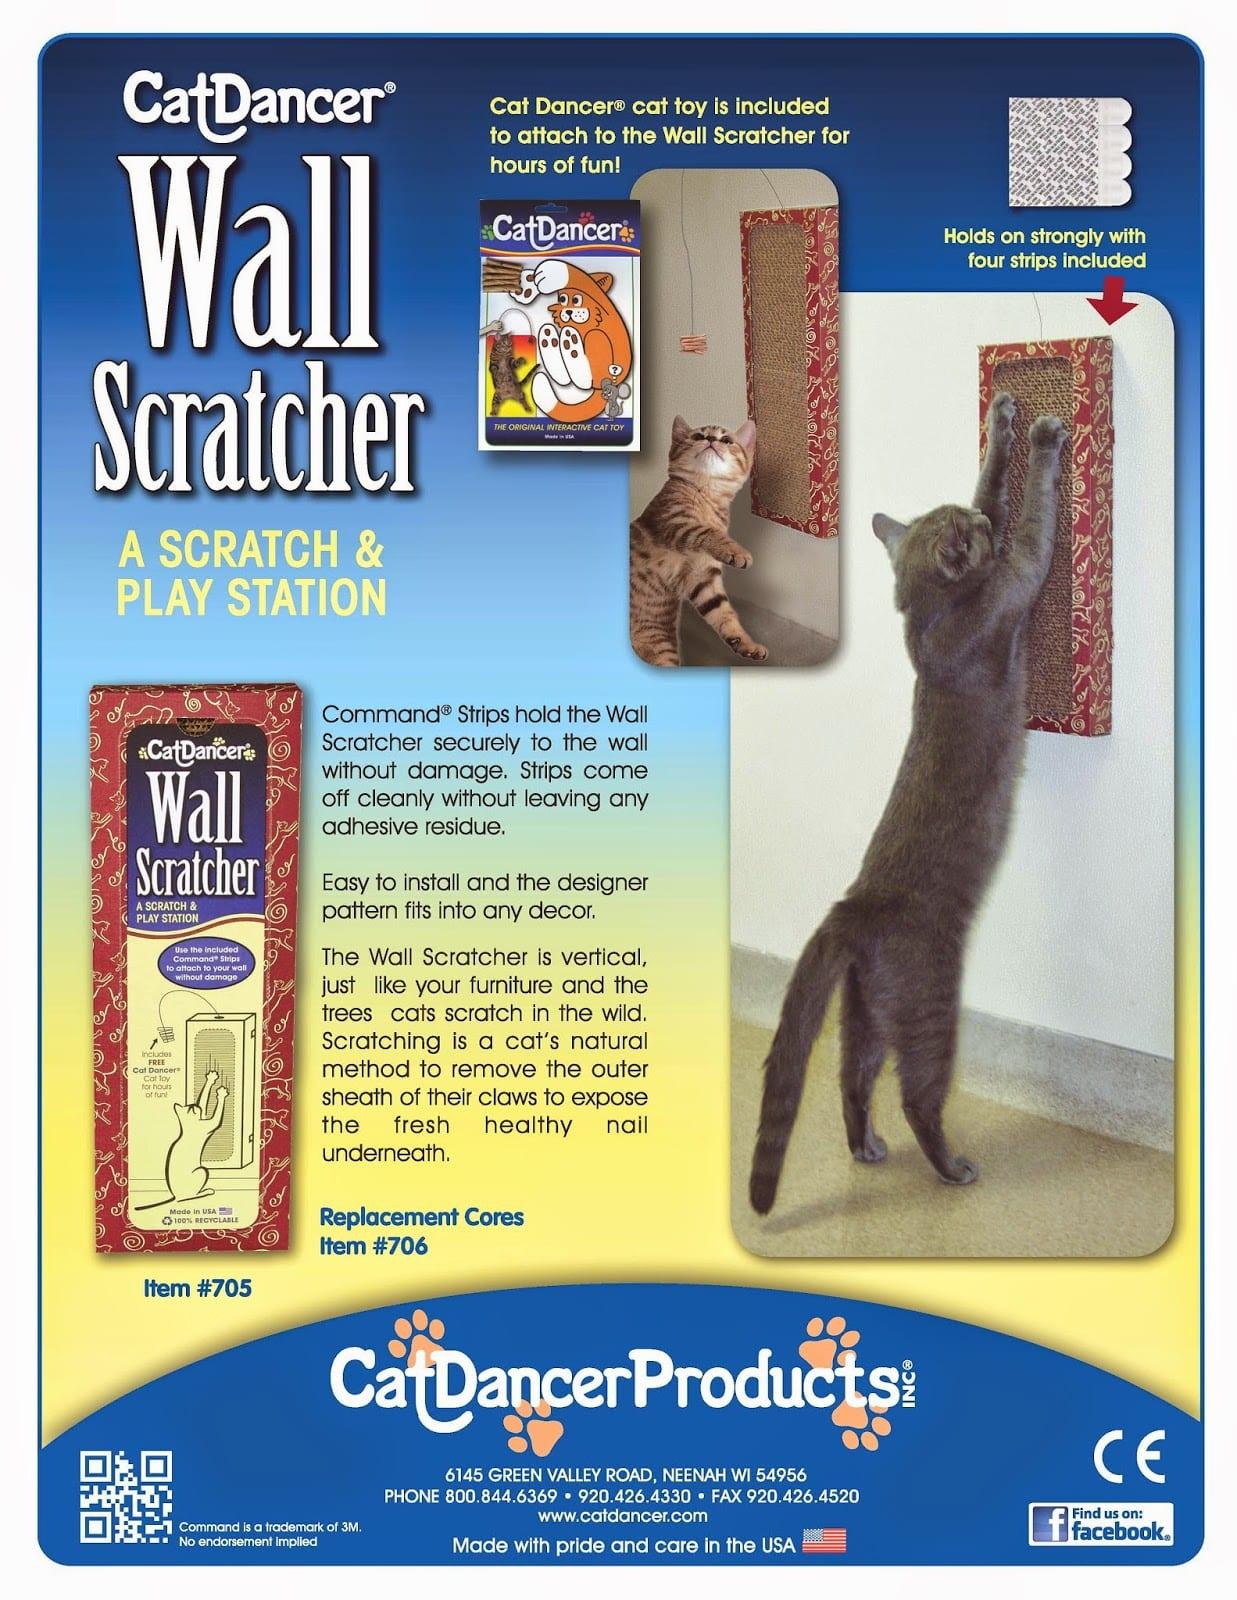 SellSheetScratcher4